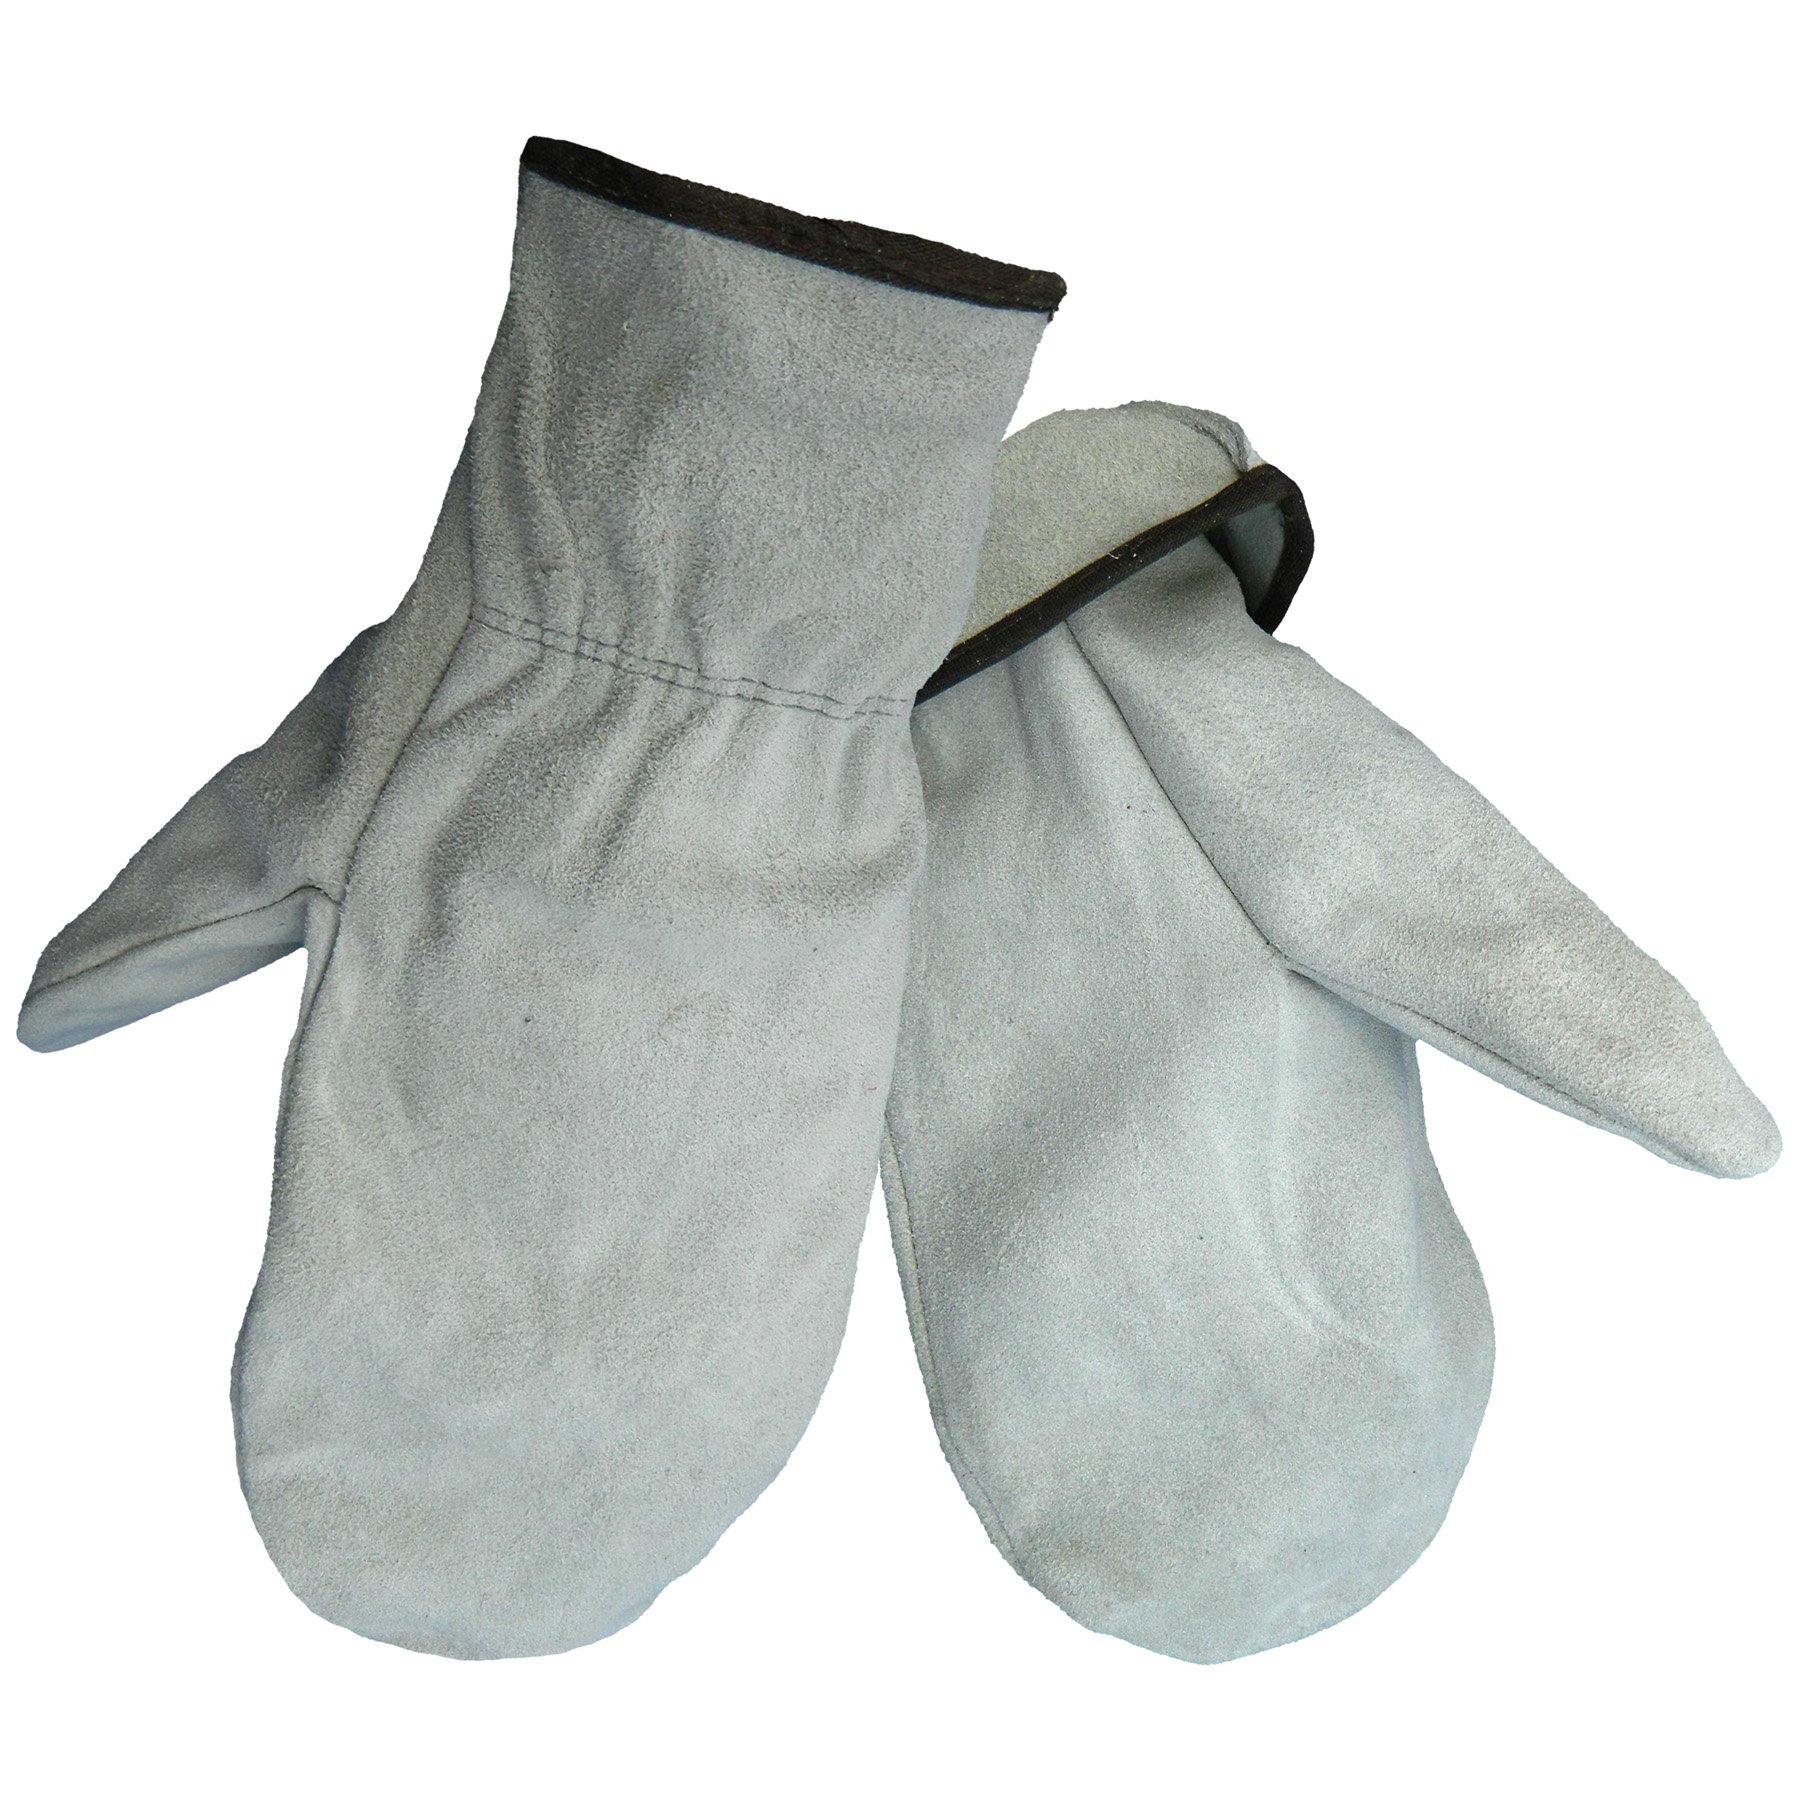 Global Glove 52MIT Split Cowhide Unlined Mitten, Large (Case of 72)